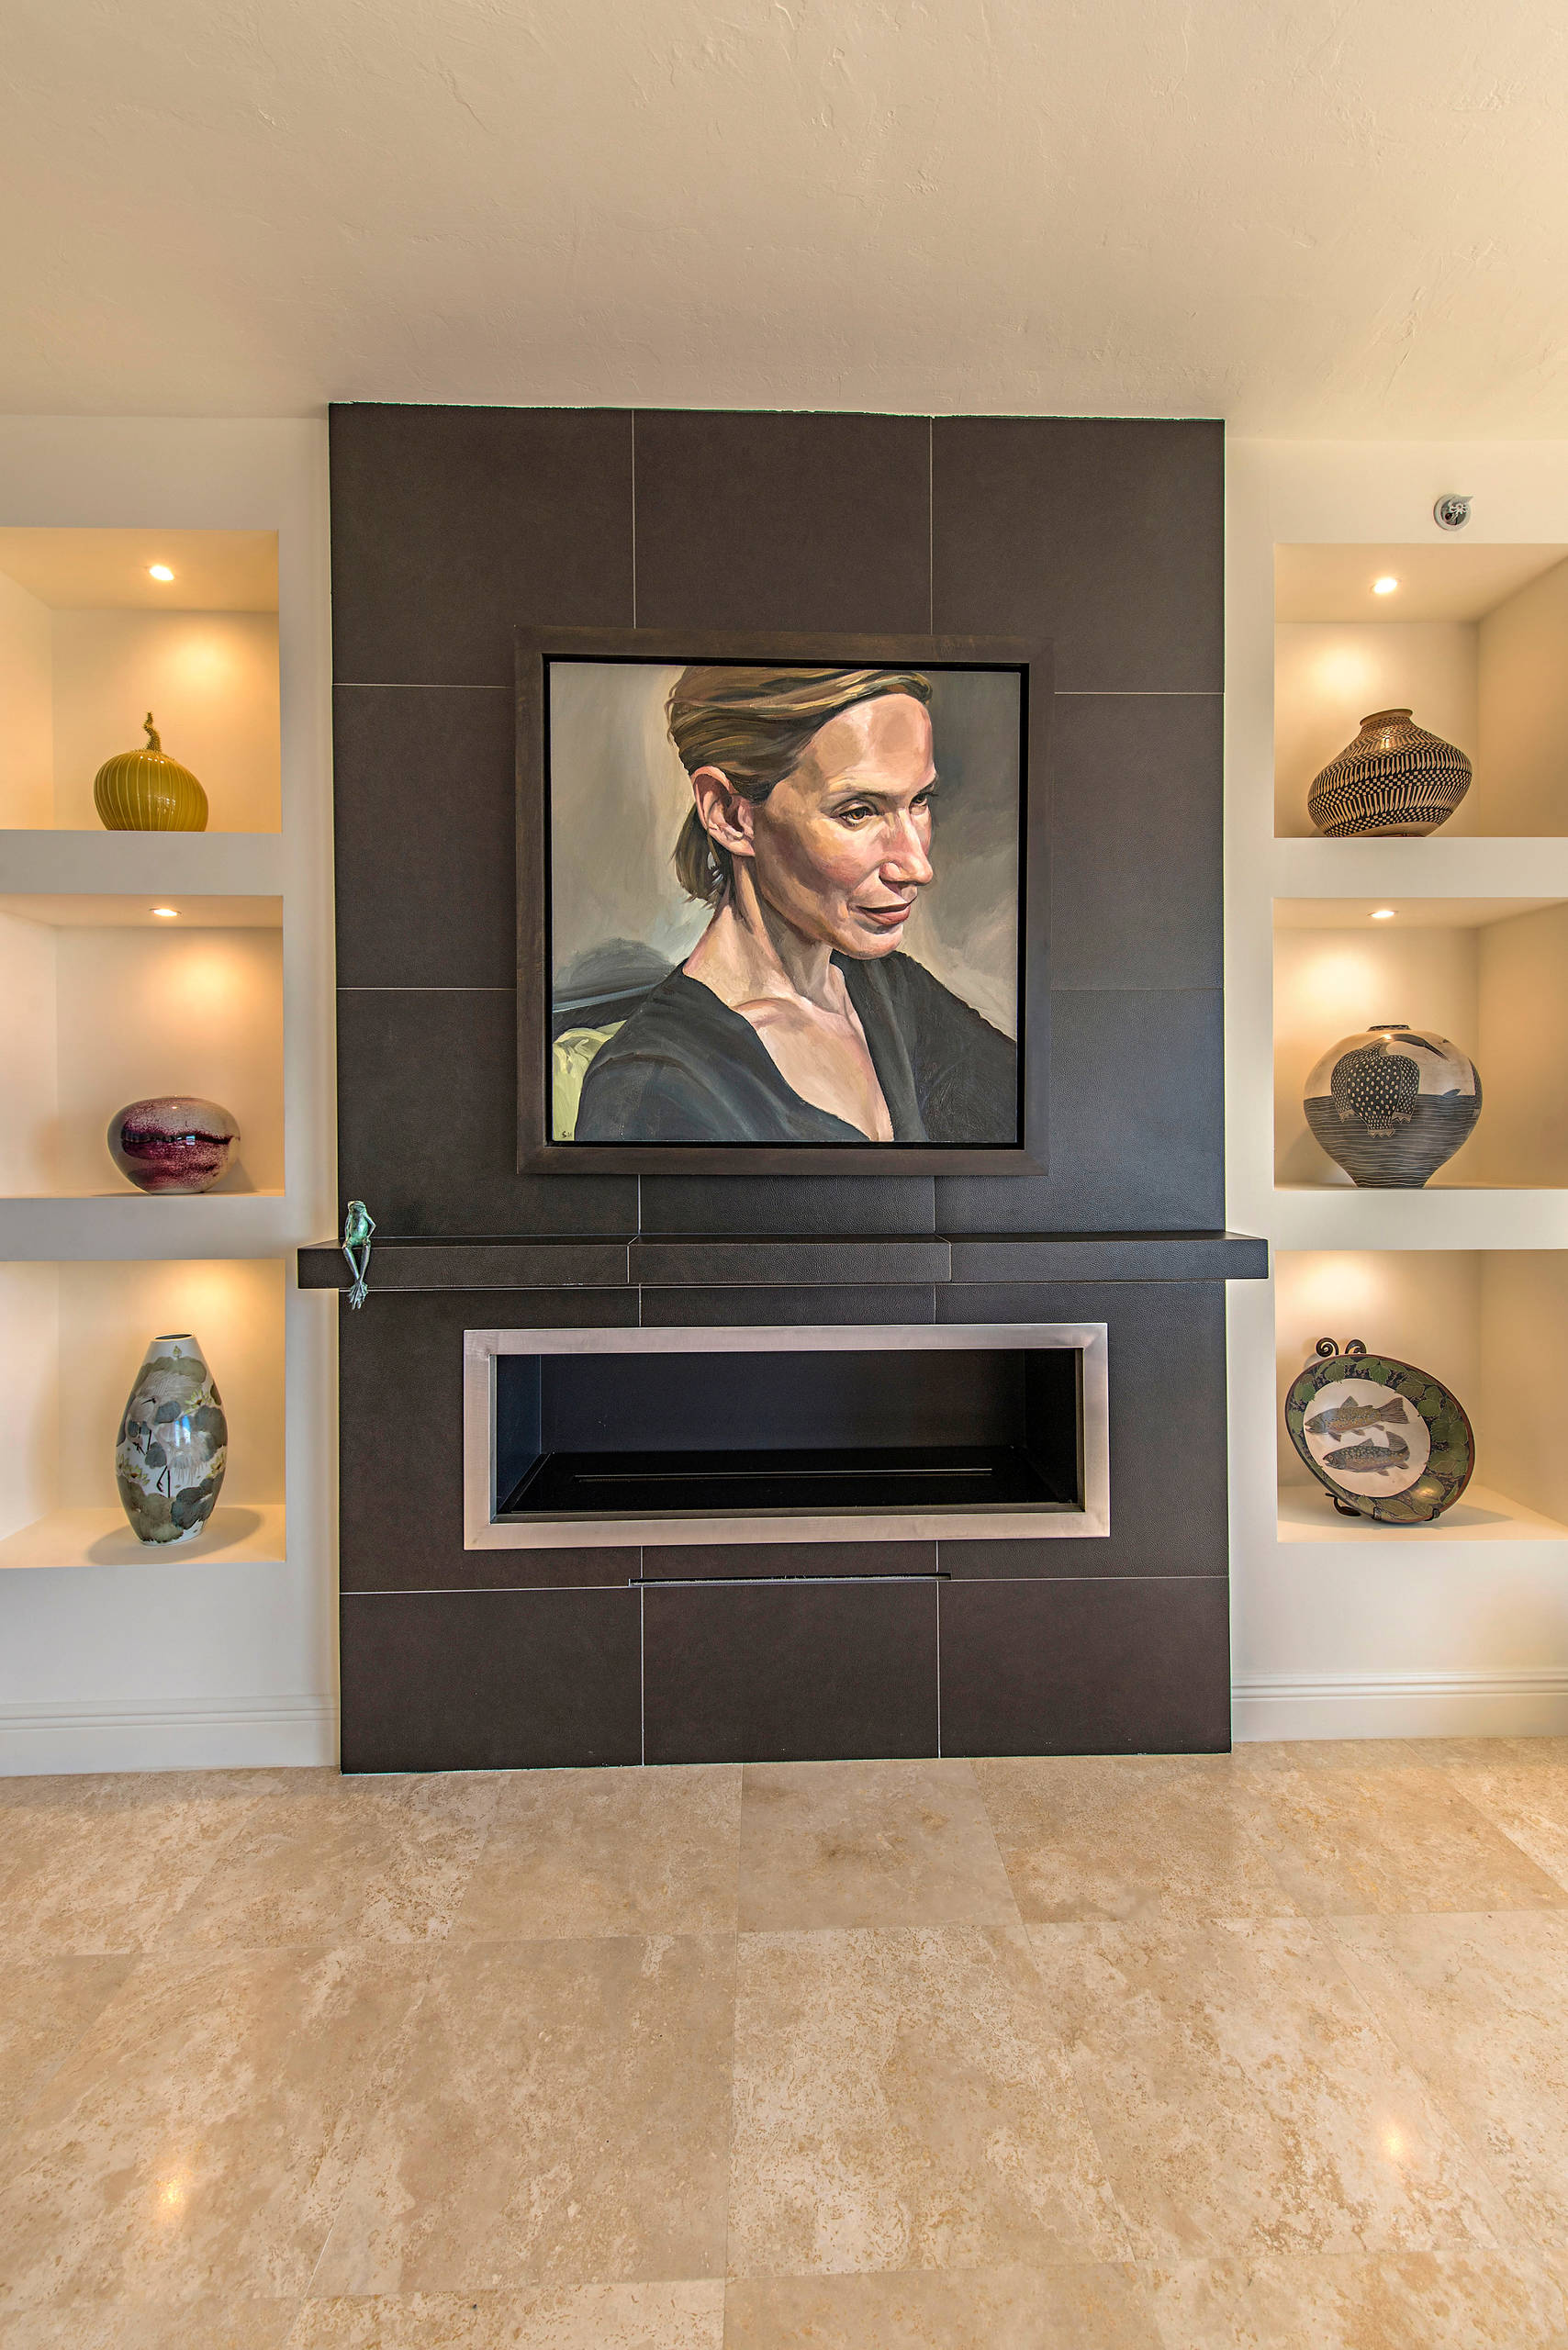 Certified Luxury Builders - 41 West - Hammock Bay Condo Remodel